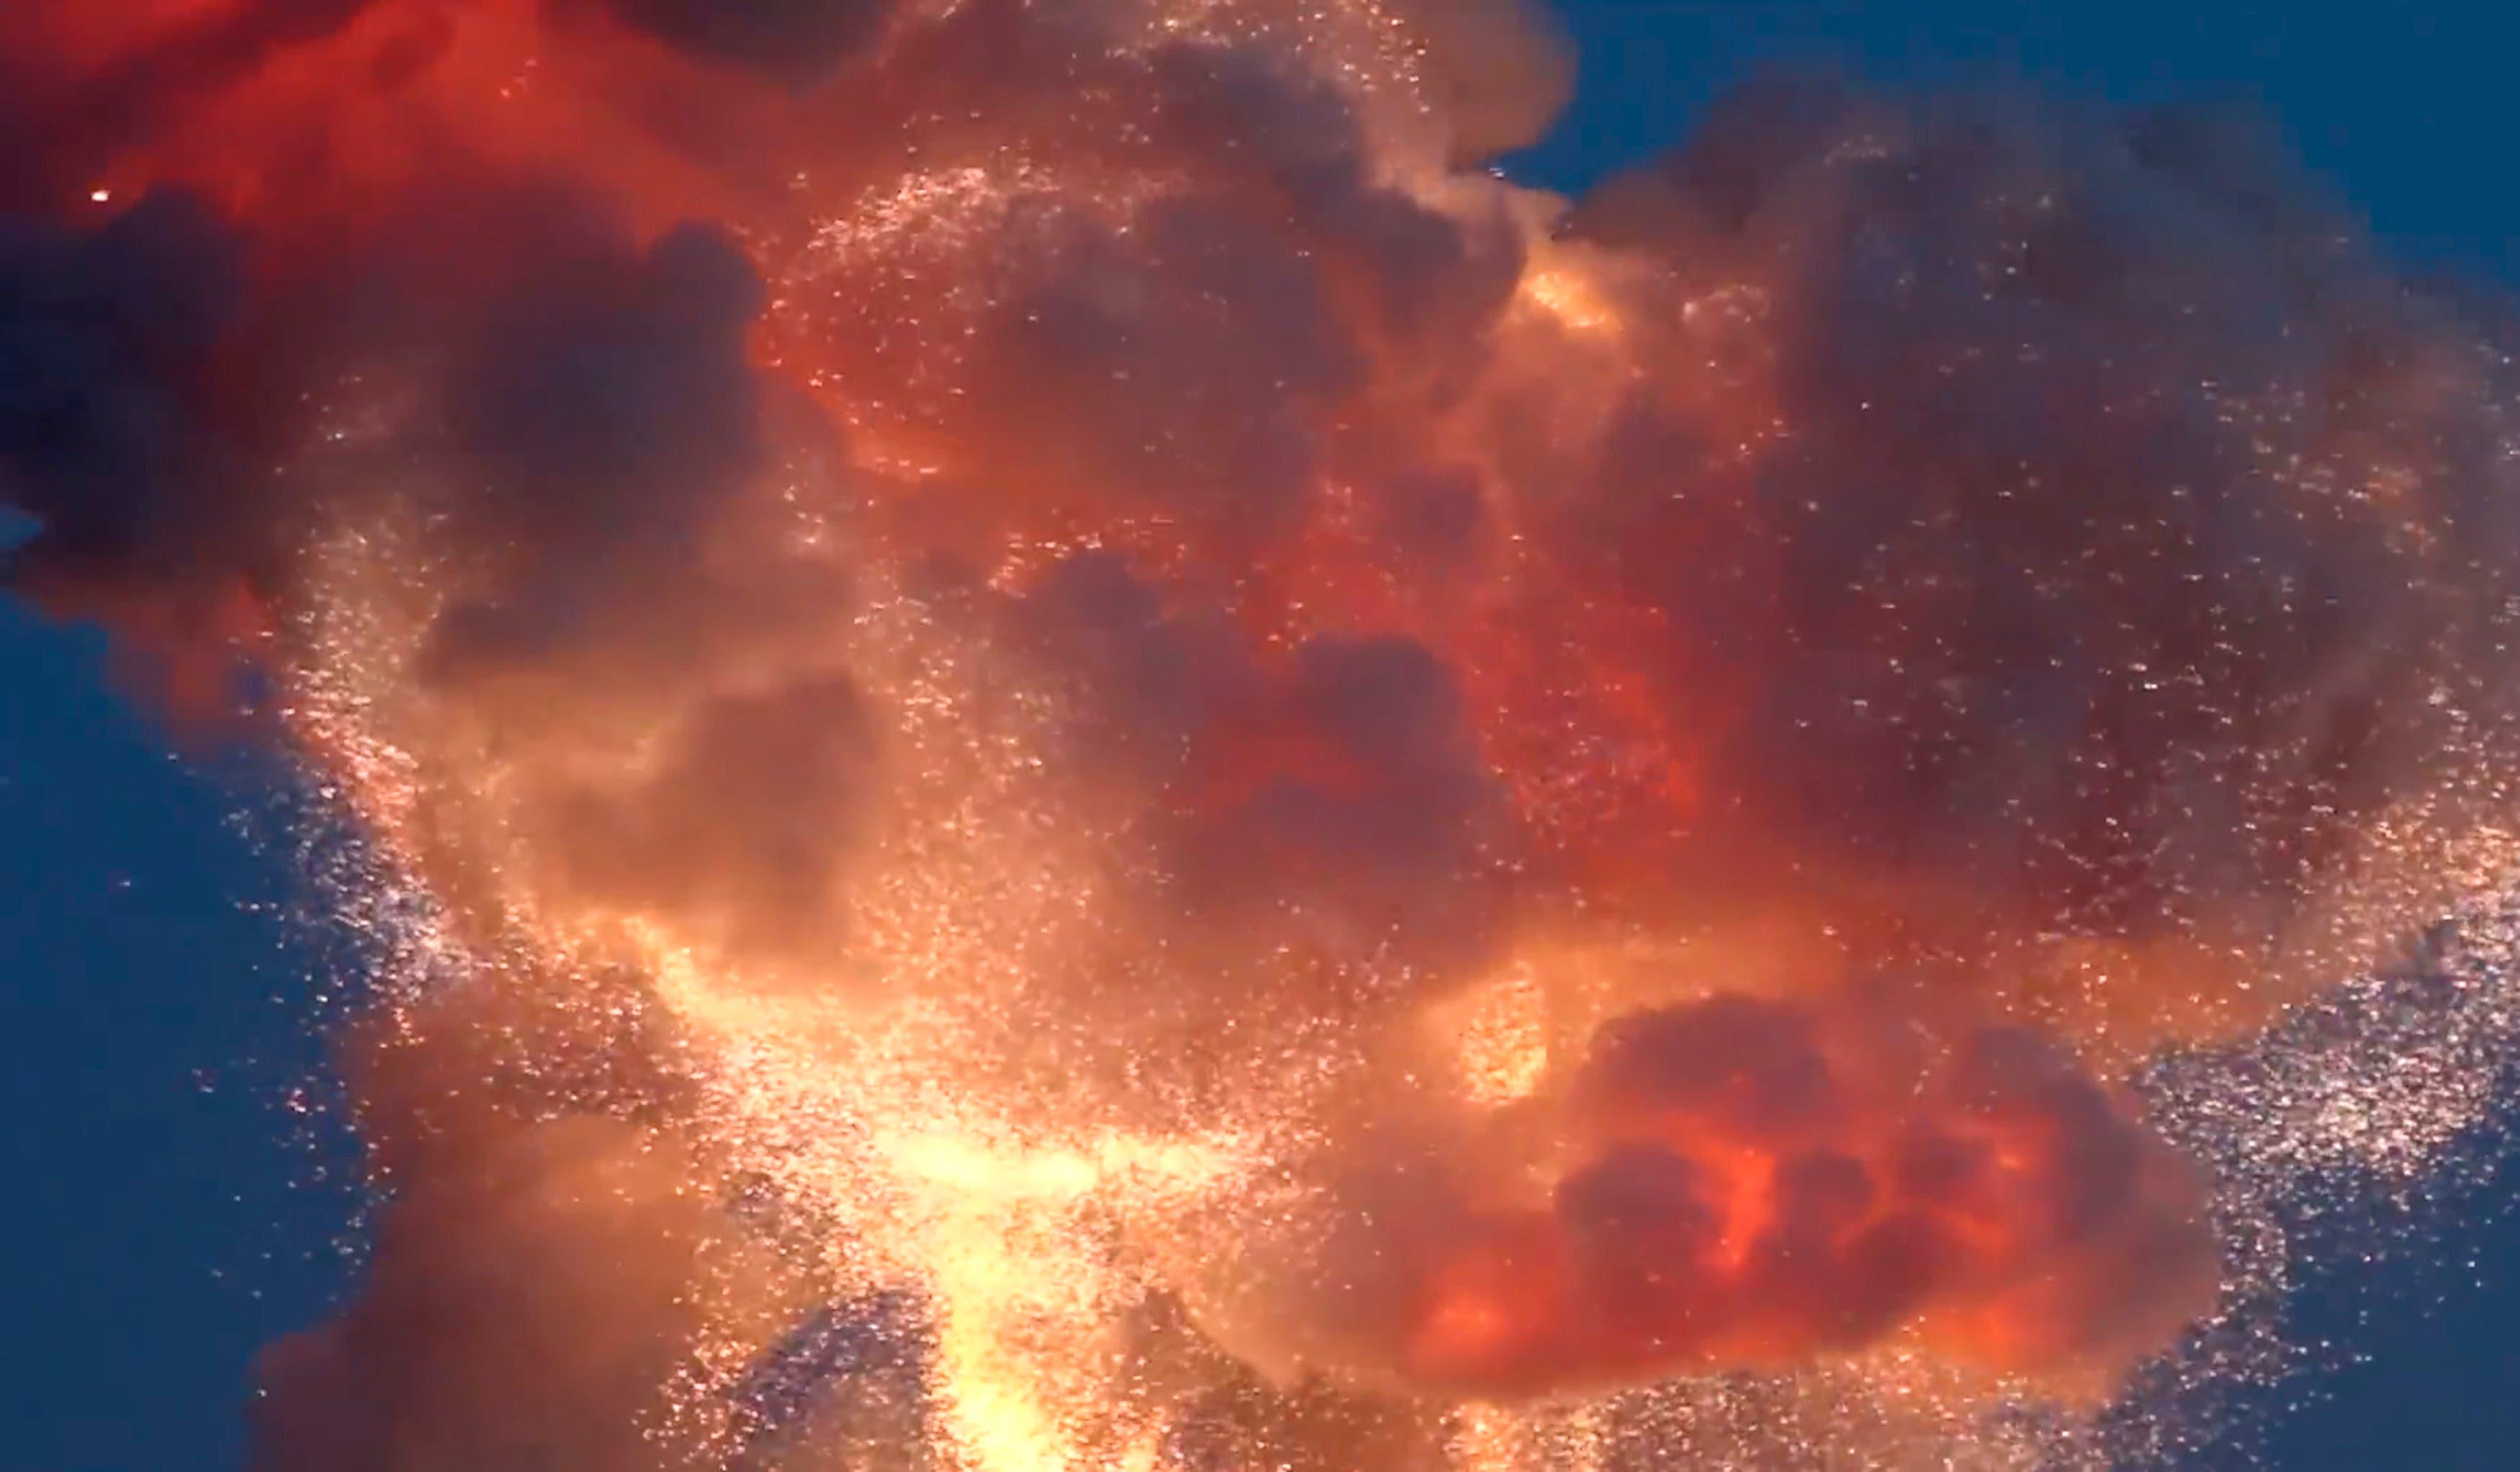 nasa space supply rocket explosion reuters